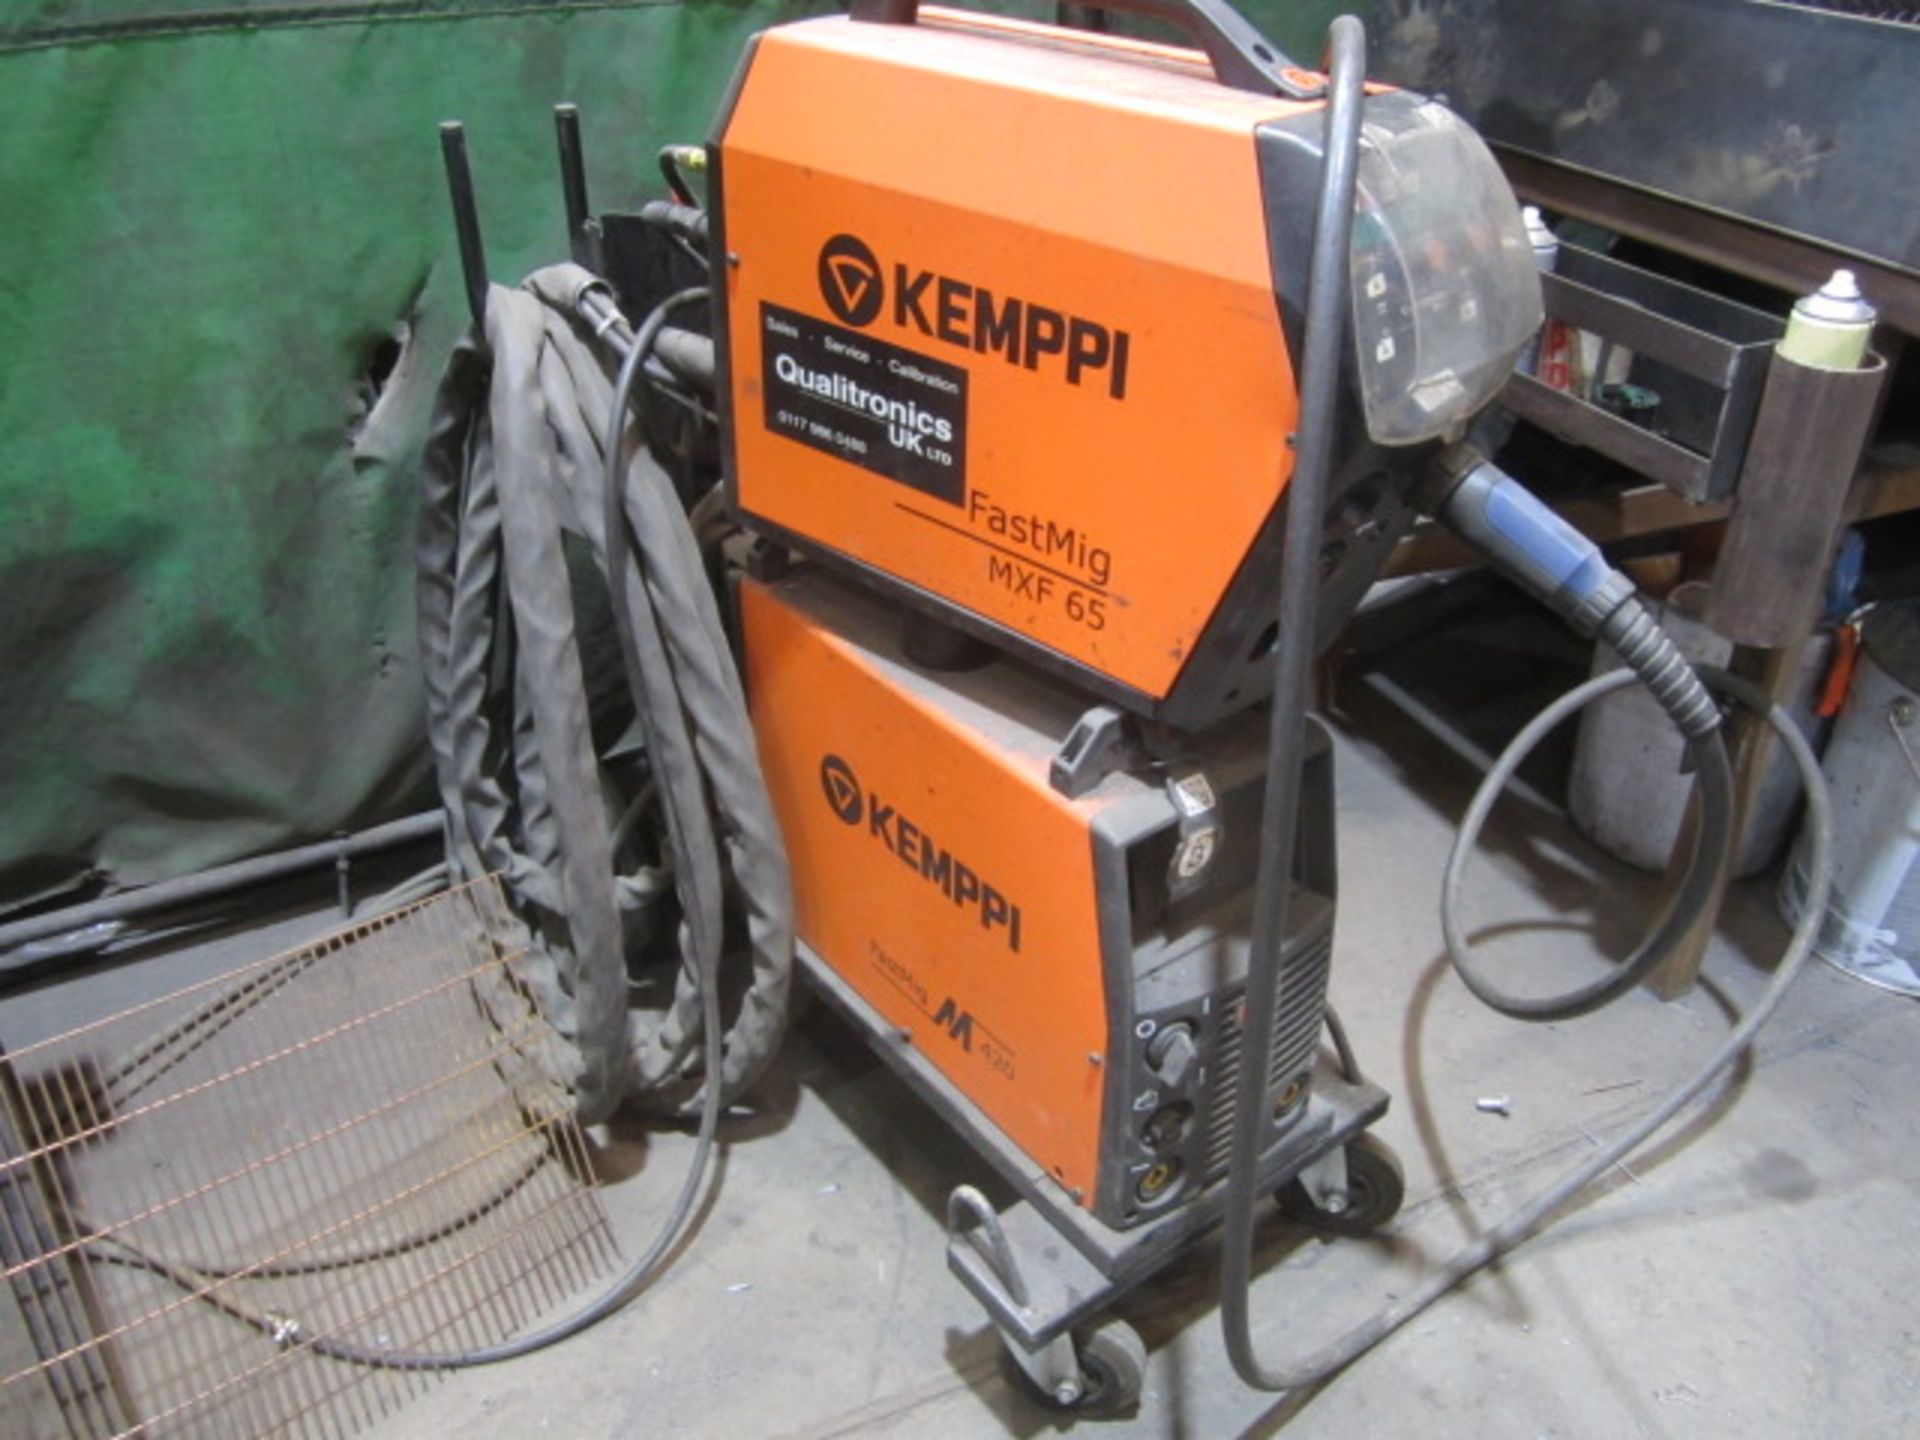 Kemppi Fast Mig M420 mig welder, serial no. 2674258, with Fast Mig MXF65 wire feeder, serial no.